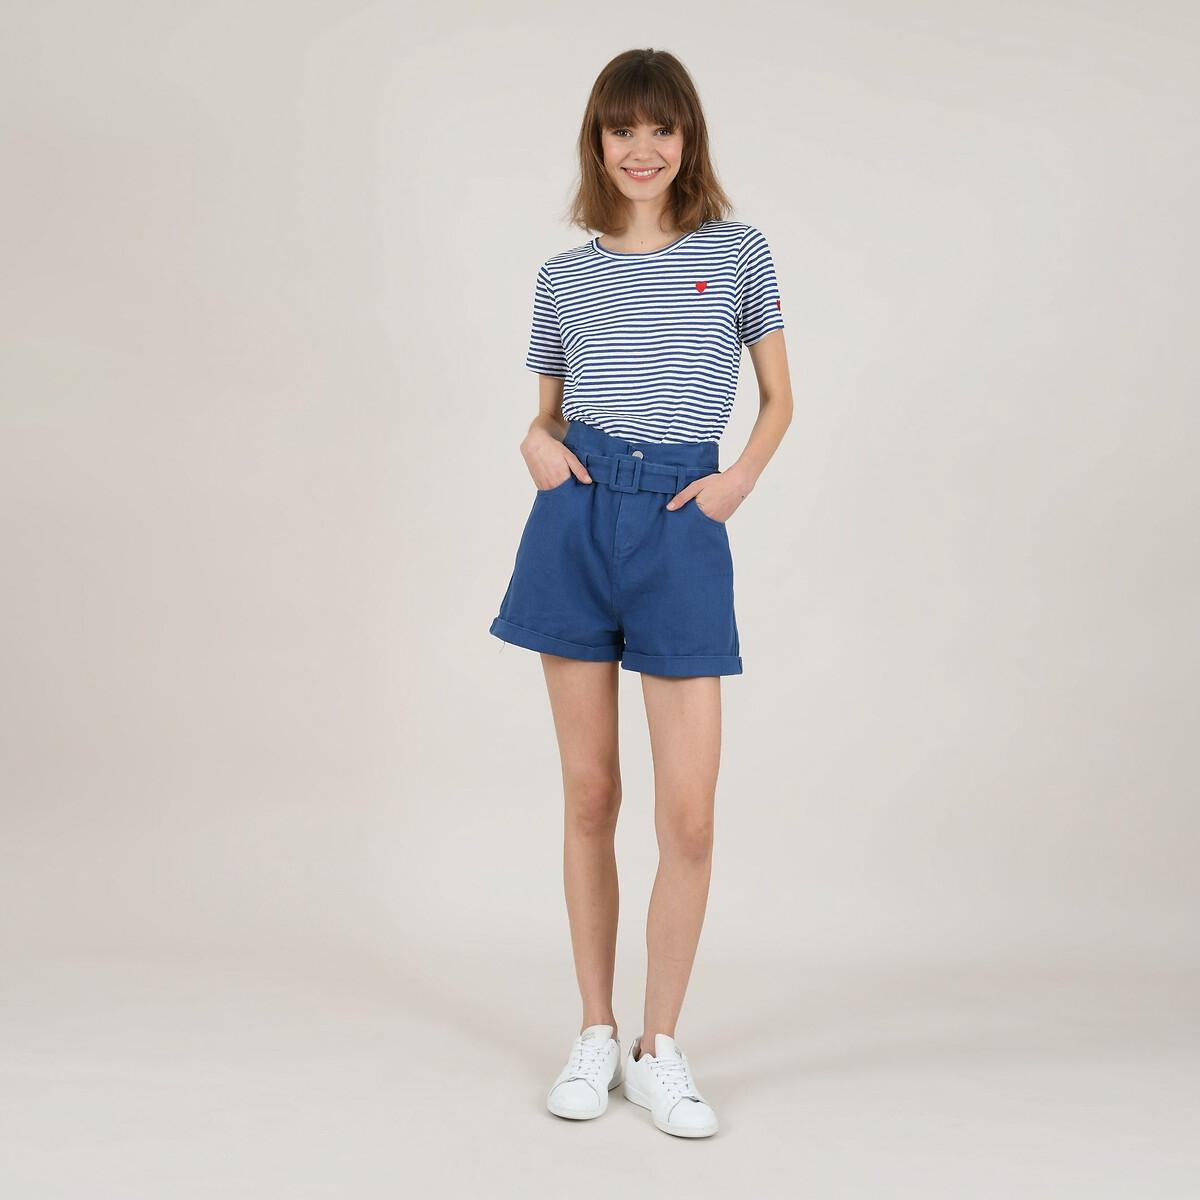 цена Шорты La Redoute С отворотами с ремешком и двумя карманами XL синий онлайн в 2017 году